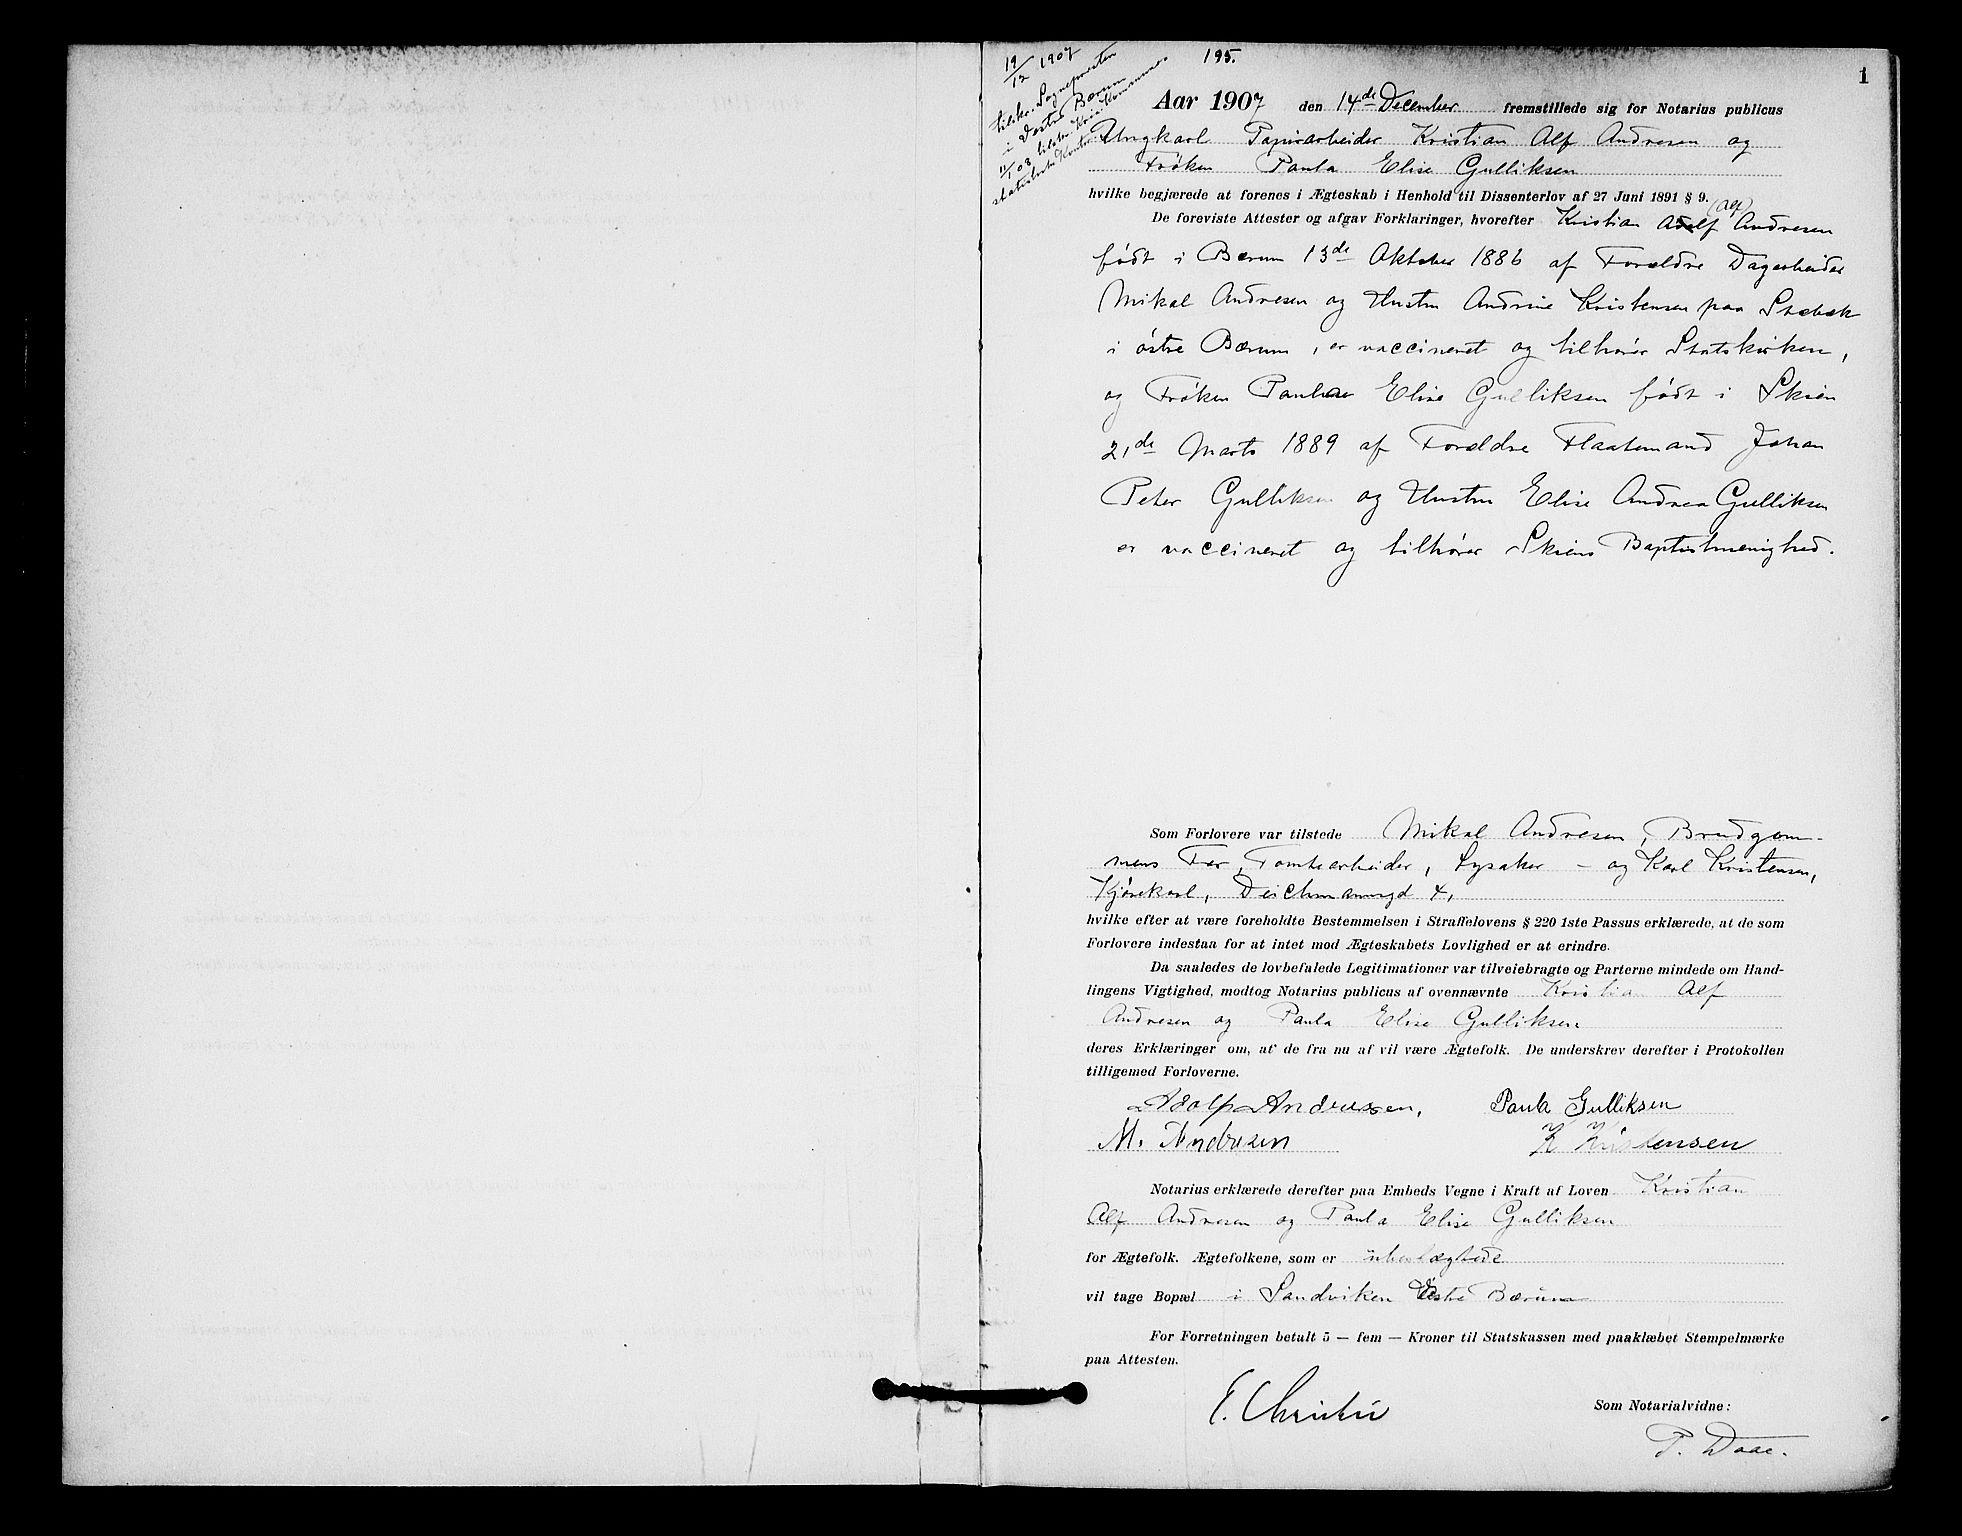 SAO, Oslo byfogd avd. I, L/Lb/Lbb/L0007: Notarialprotokoll, rekke II: Vigsler, 1907-1911, s. 1a